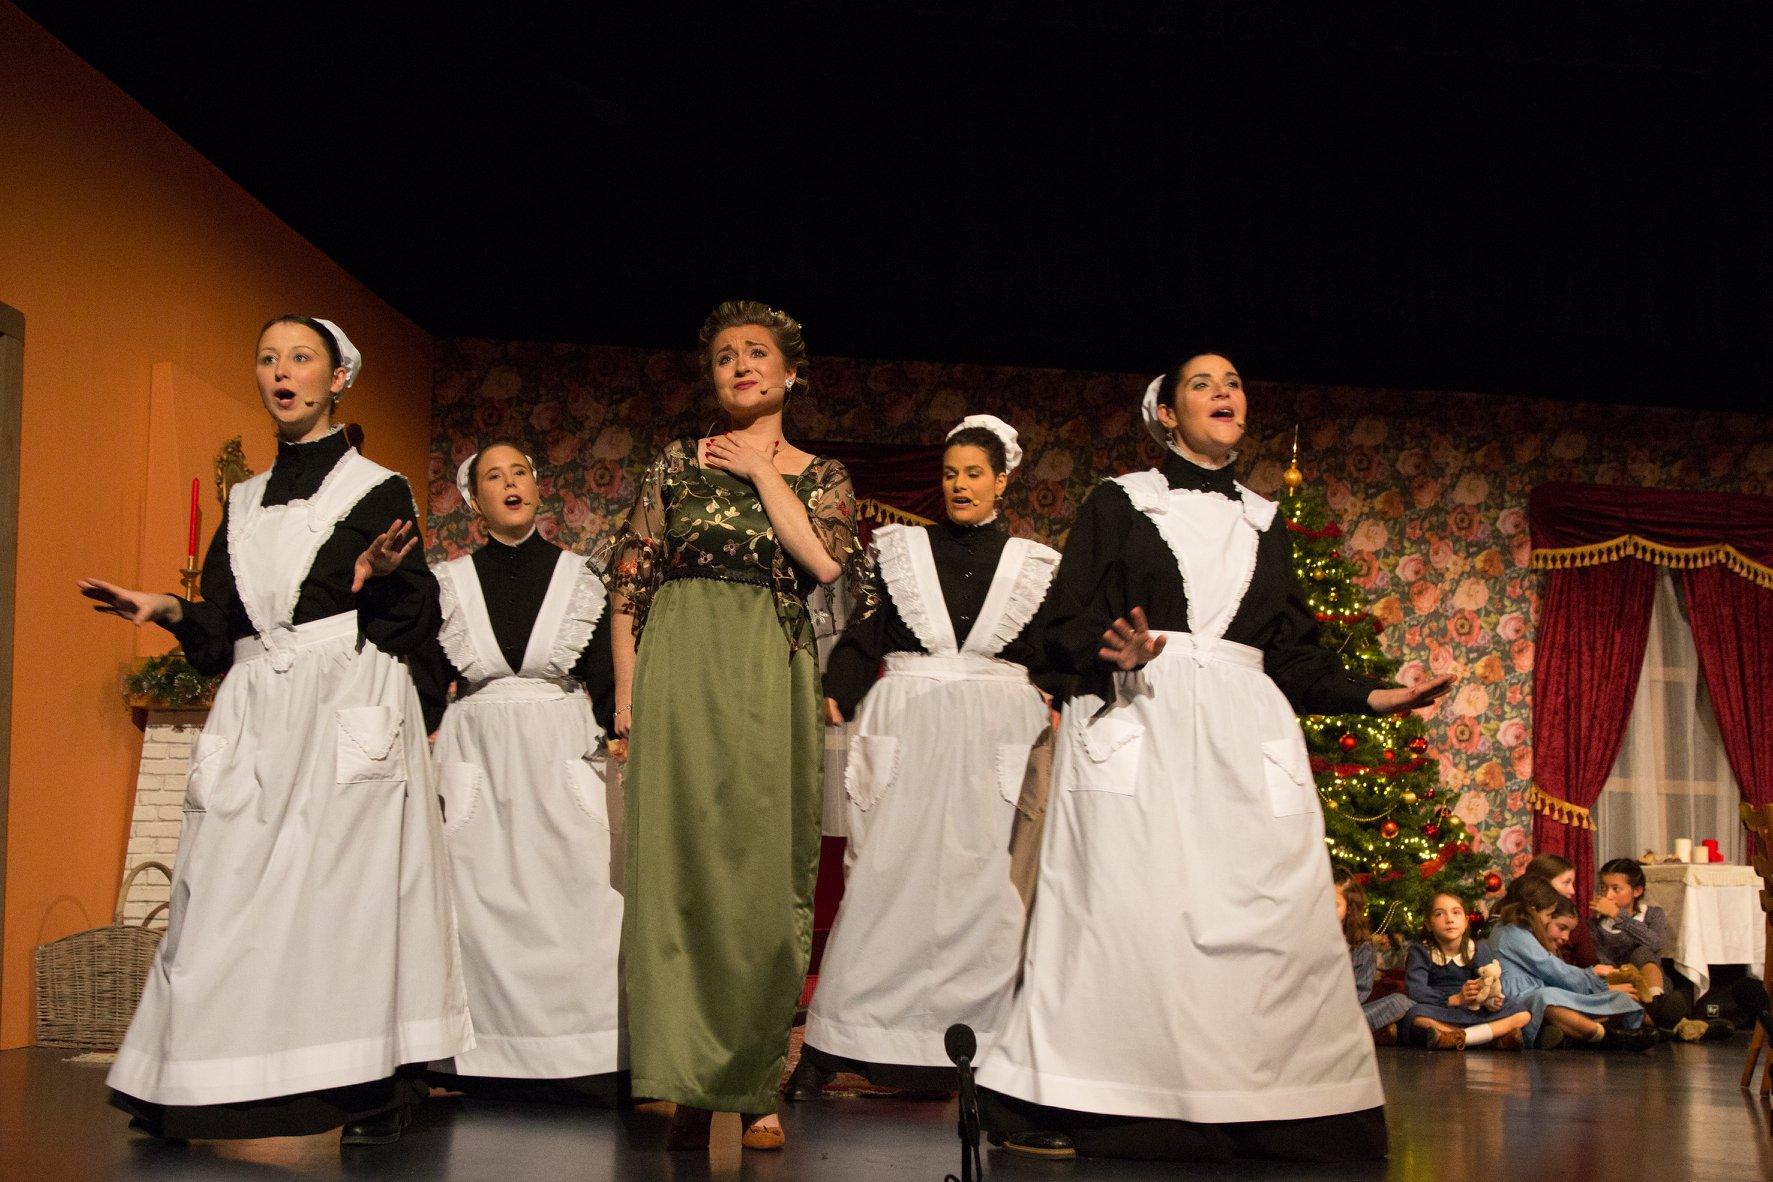 L'incroyable Noël des enfants Maxwell